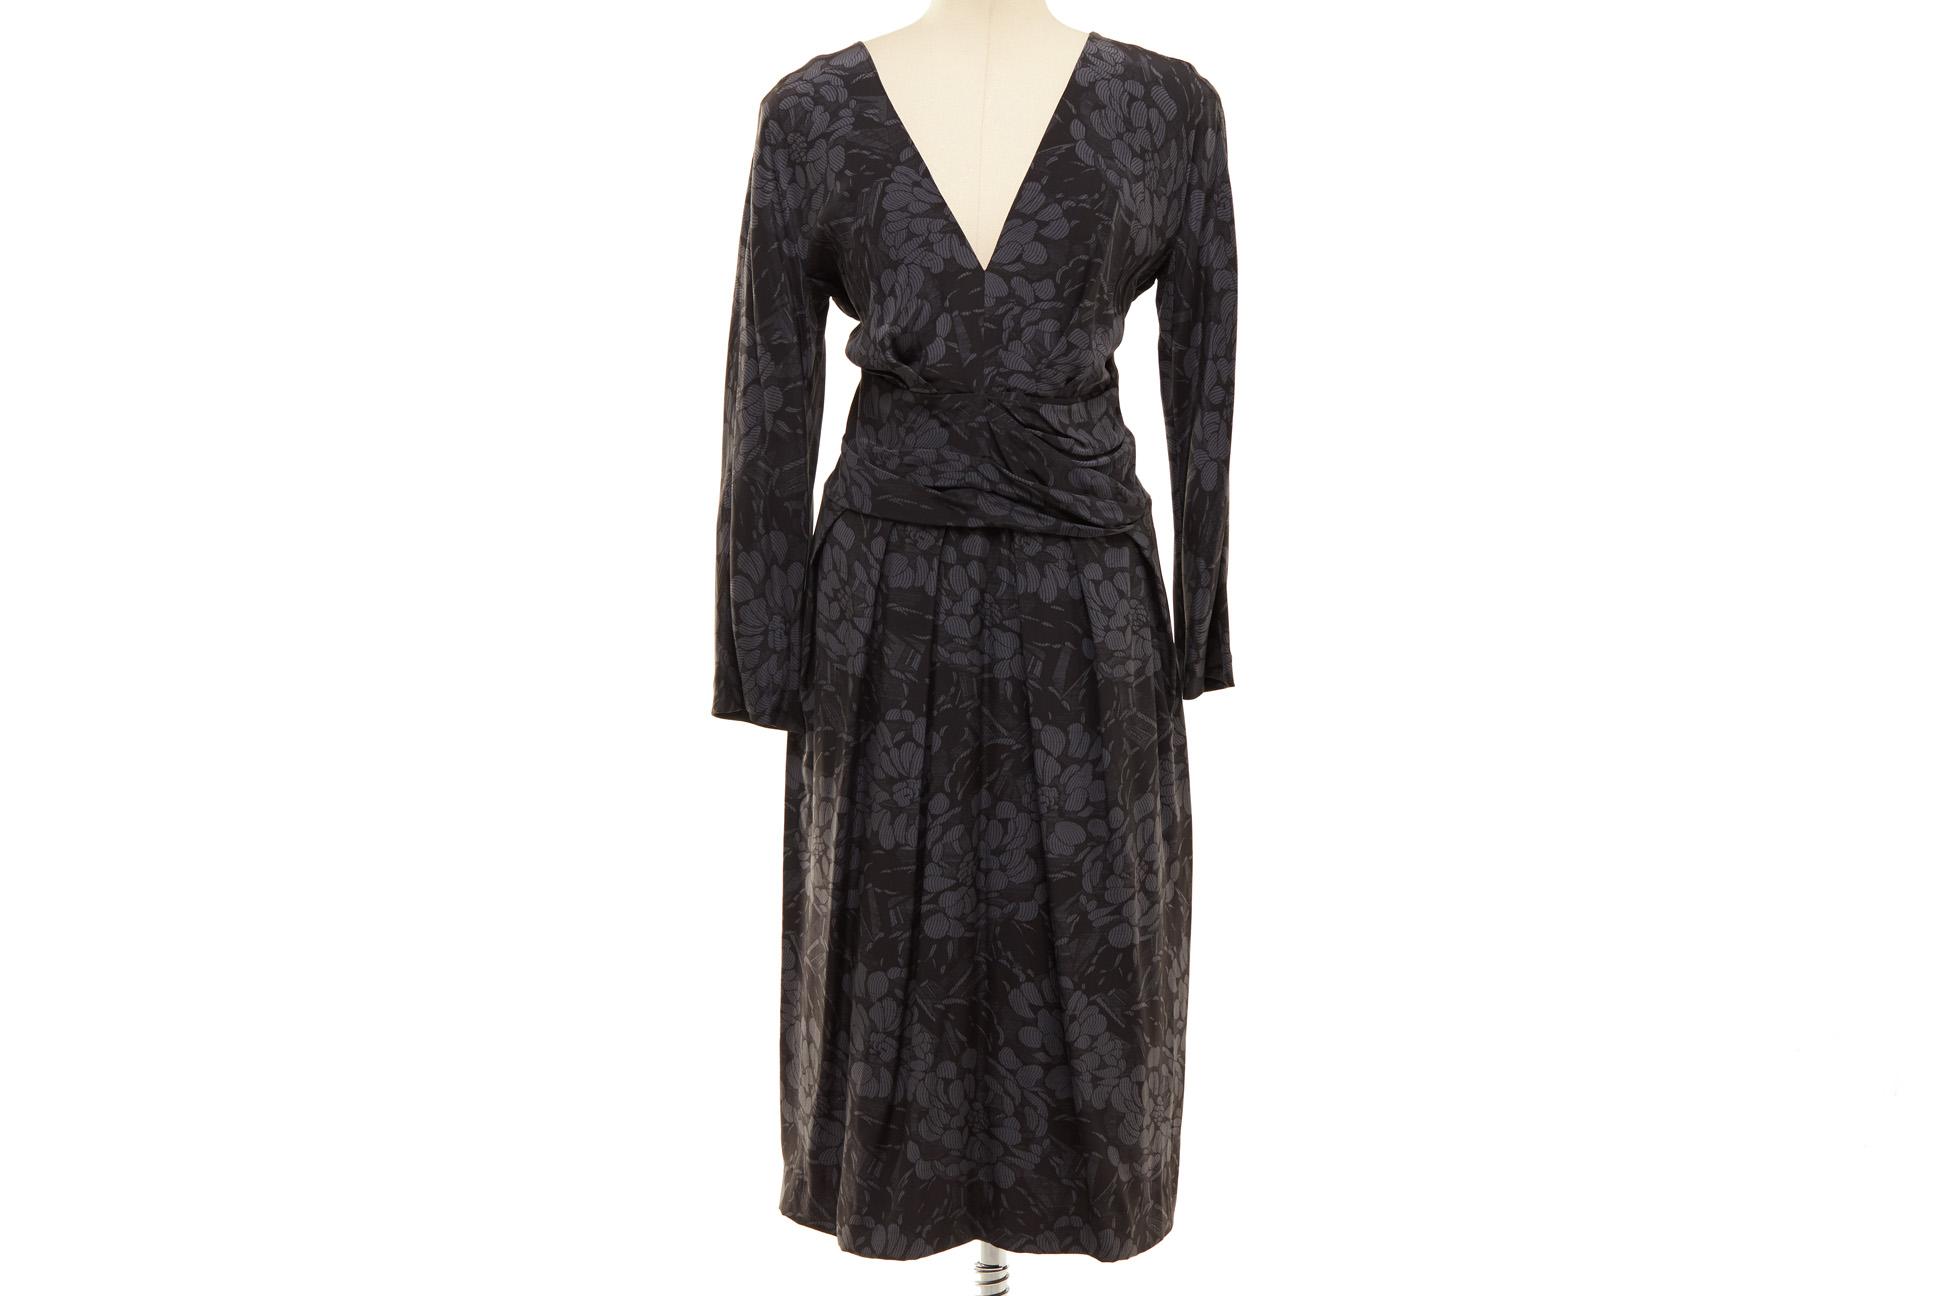 A BOTTEGA VENETA BLACK FLORAL SILK DRESS